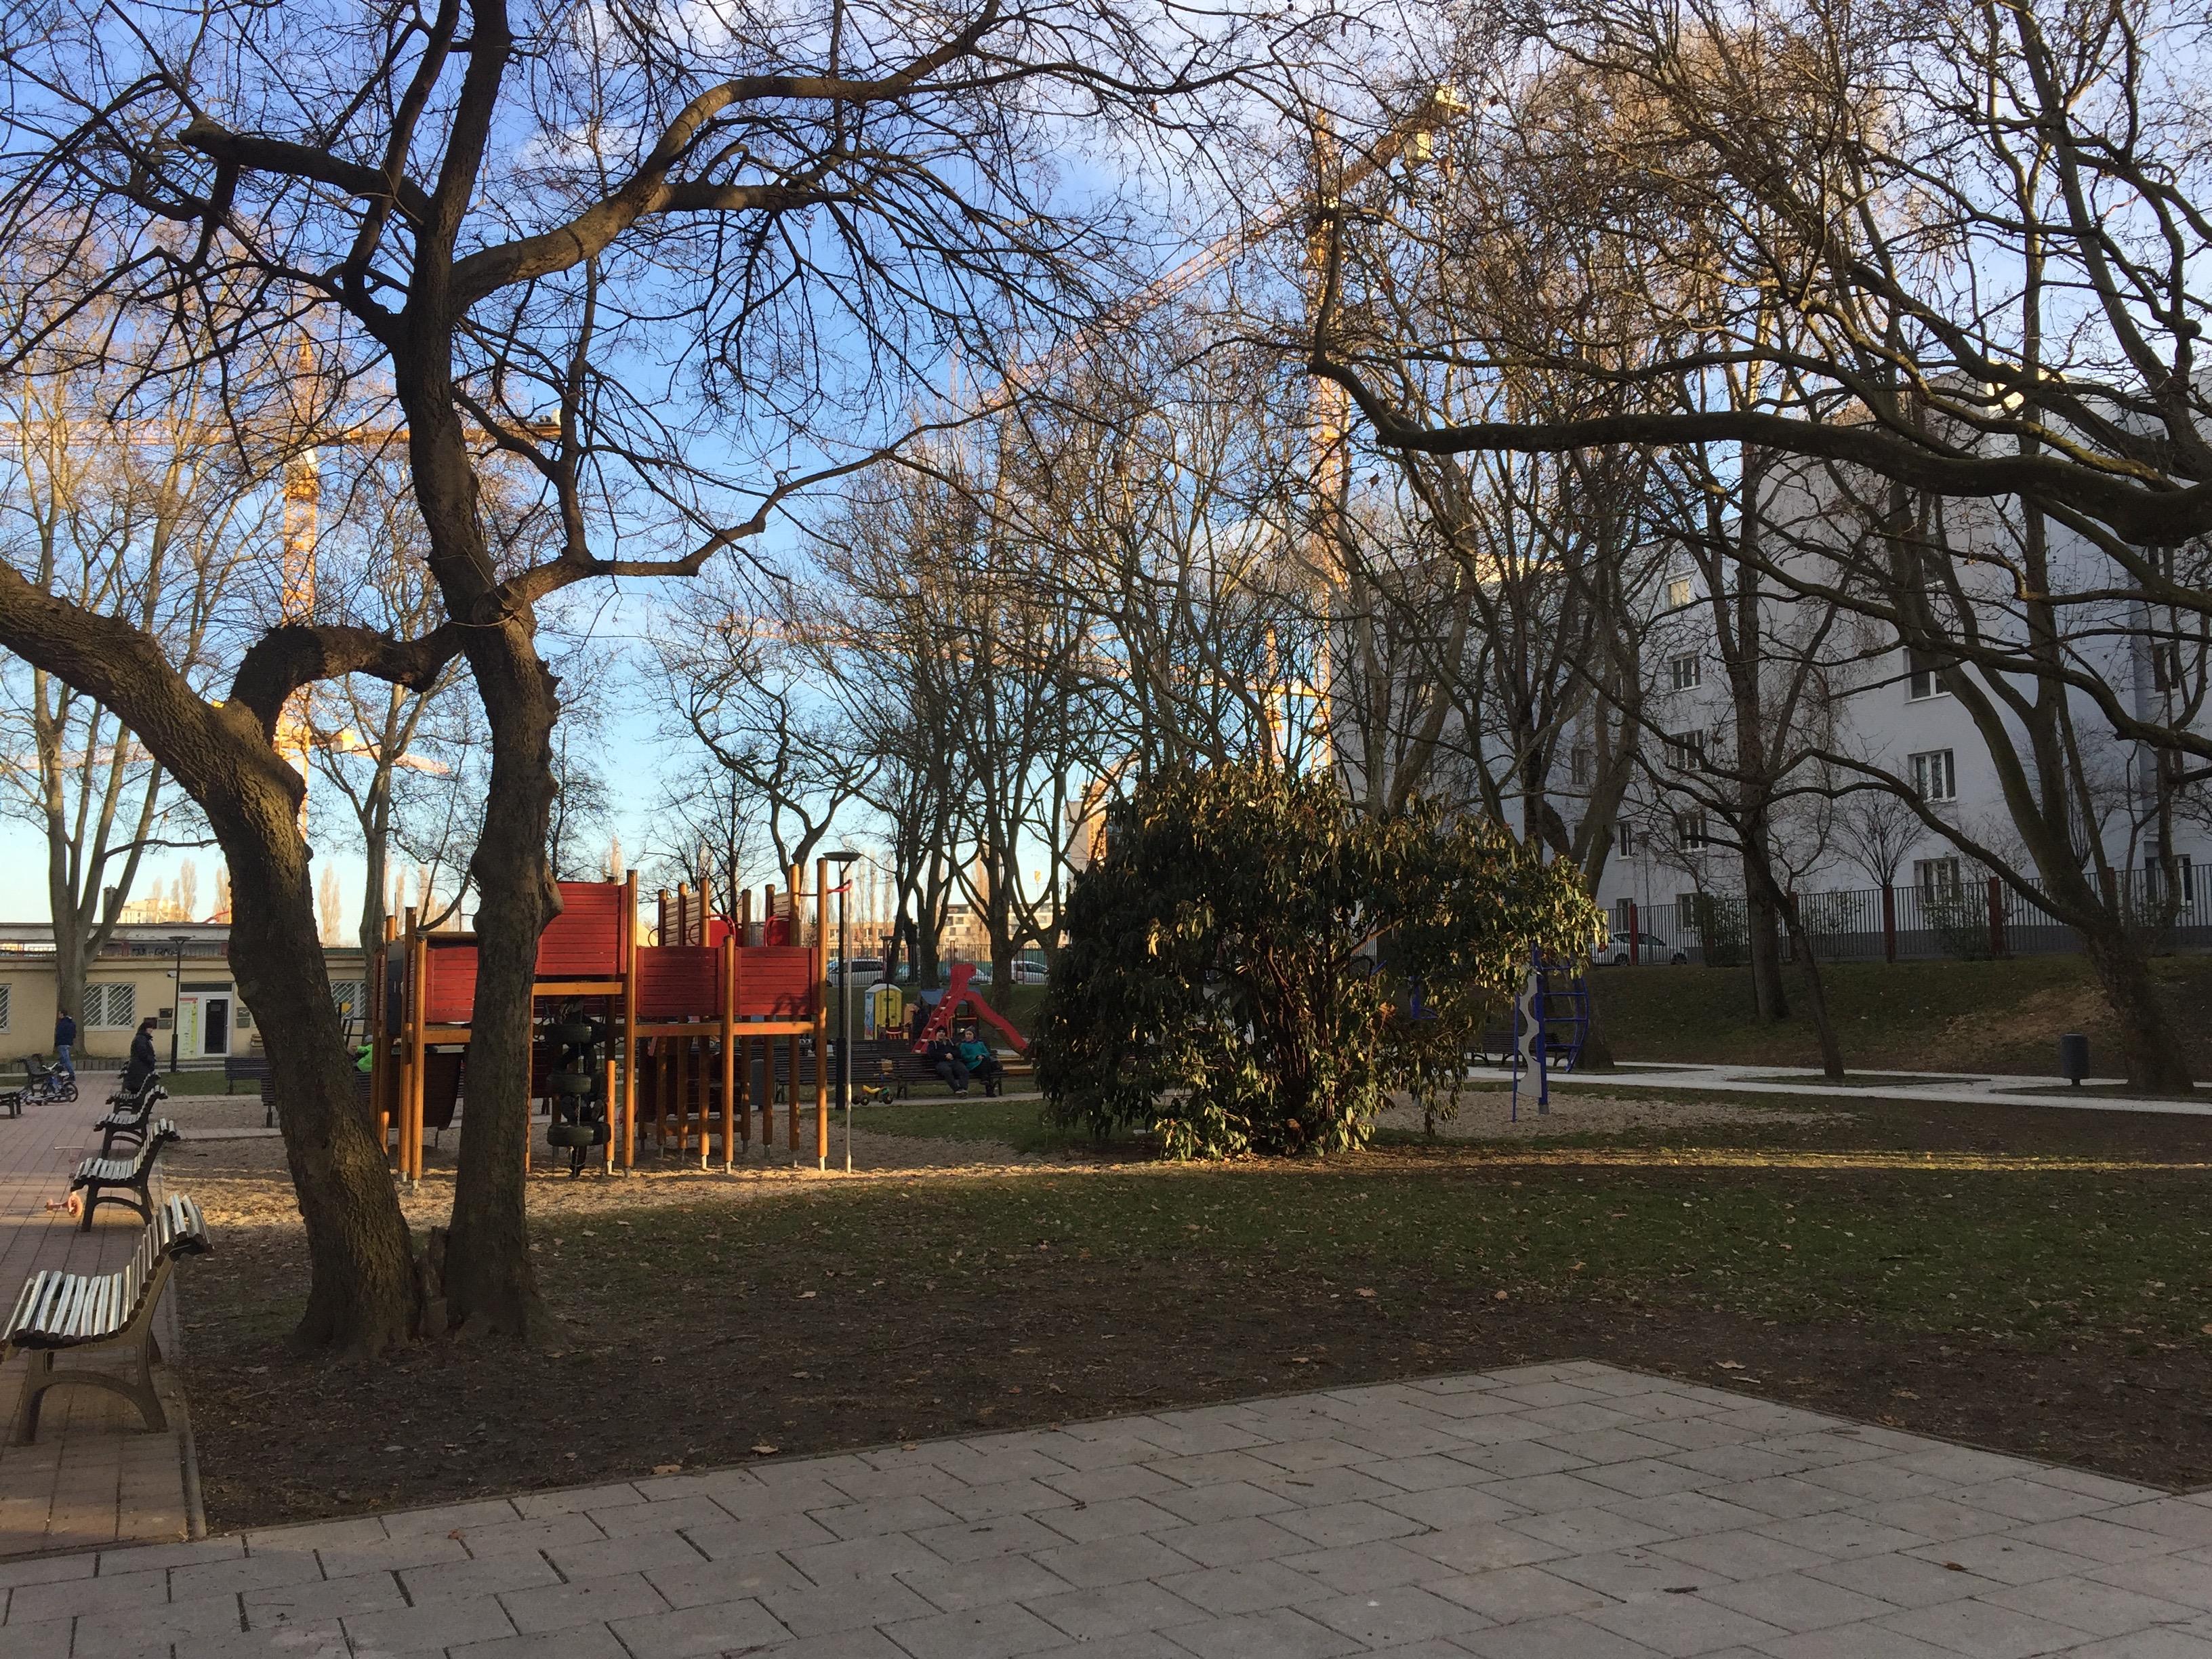 Detské ihrisko Jama prešlo rekonštrukciou